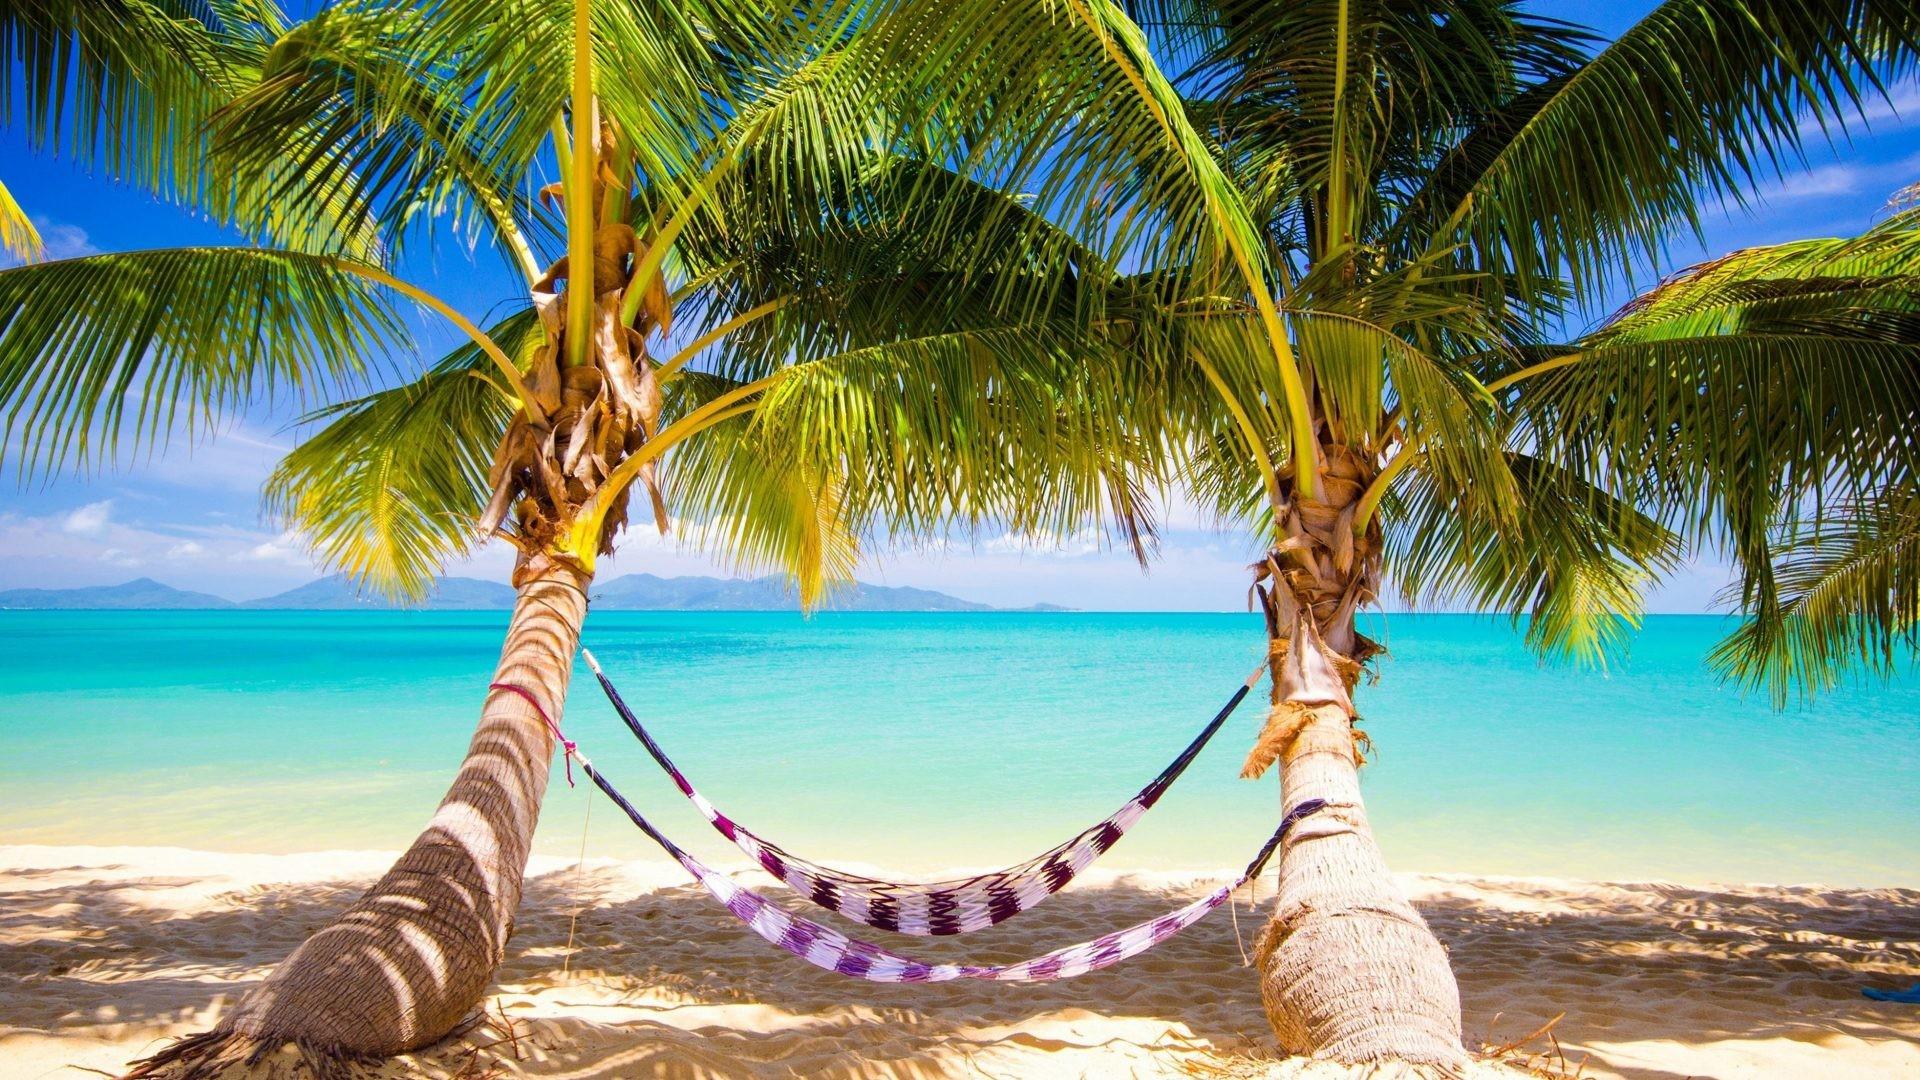 Paradise Tag – Ocean Sunshine Beach Paradise Palms Sea Summer Tropical  Nature Hd Wallpaper Pic for